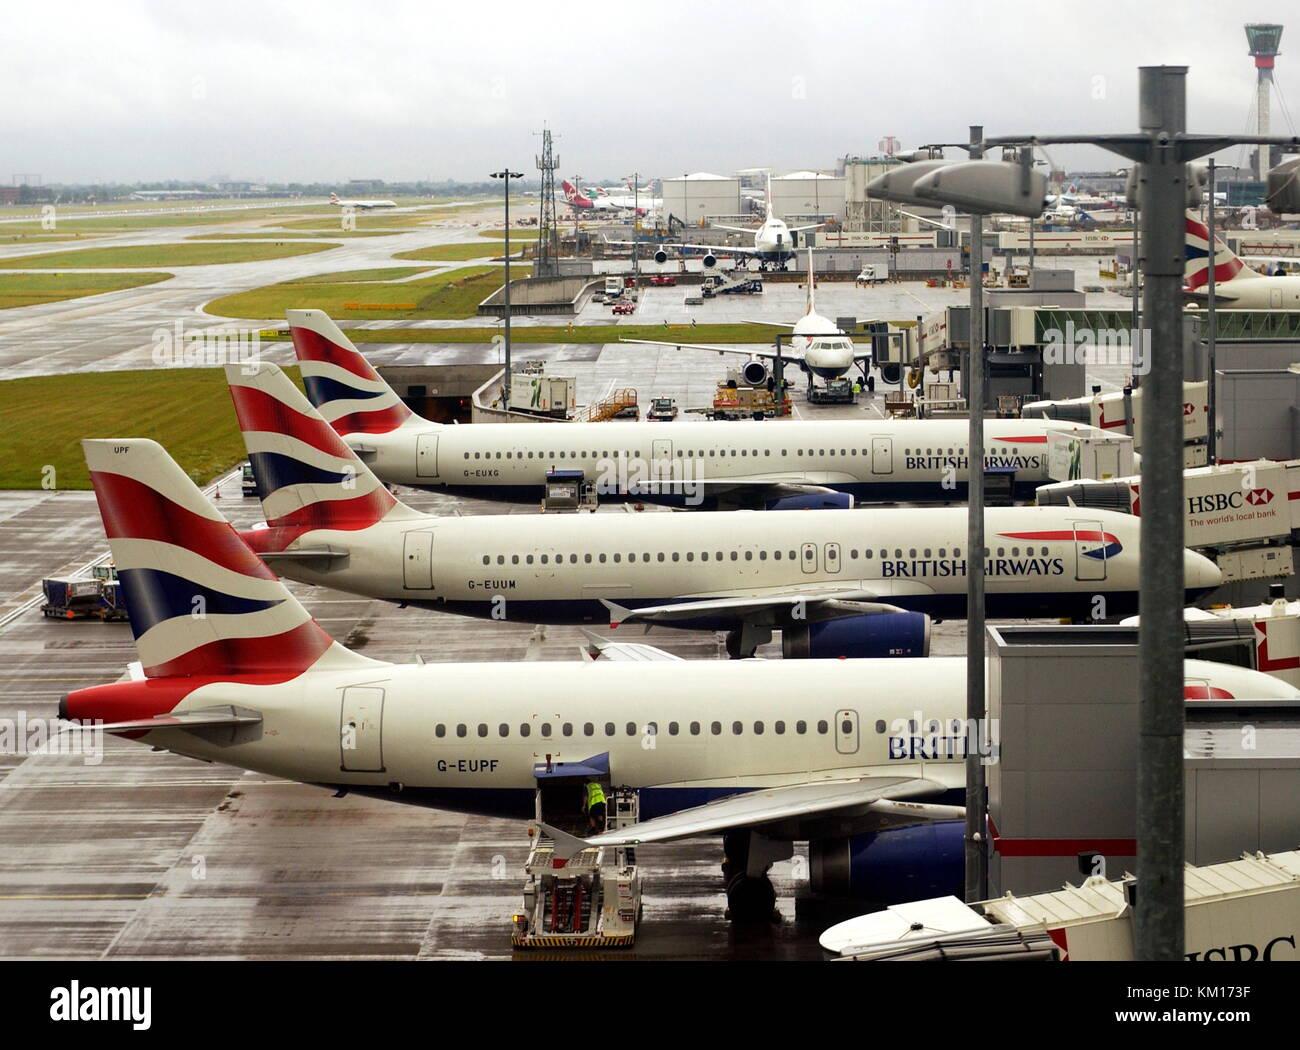 AJAXNETPHOTO. 2008, LONDON,HEATHROW, ENGLAND. - TERMINAL 5, LONDON HEATHROW AIRPORT. PHOTO:JONATHAN EASTLAND/AJAX - Stock Image